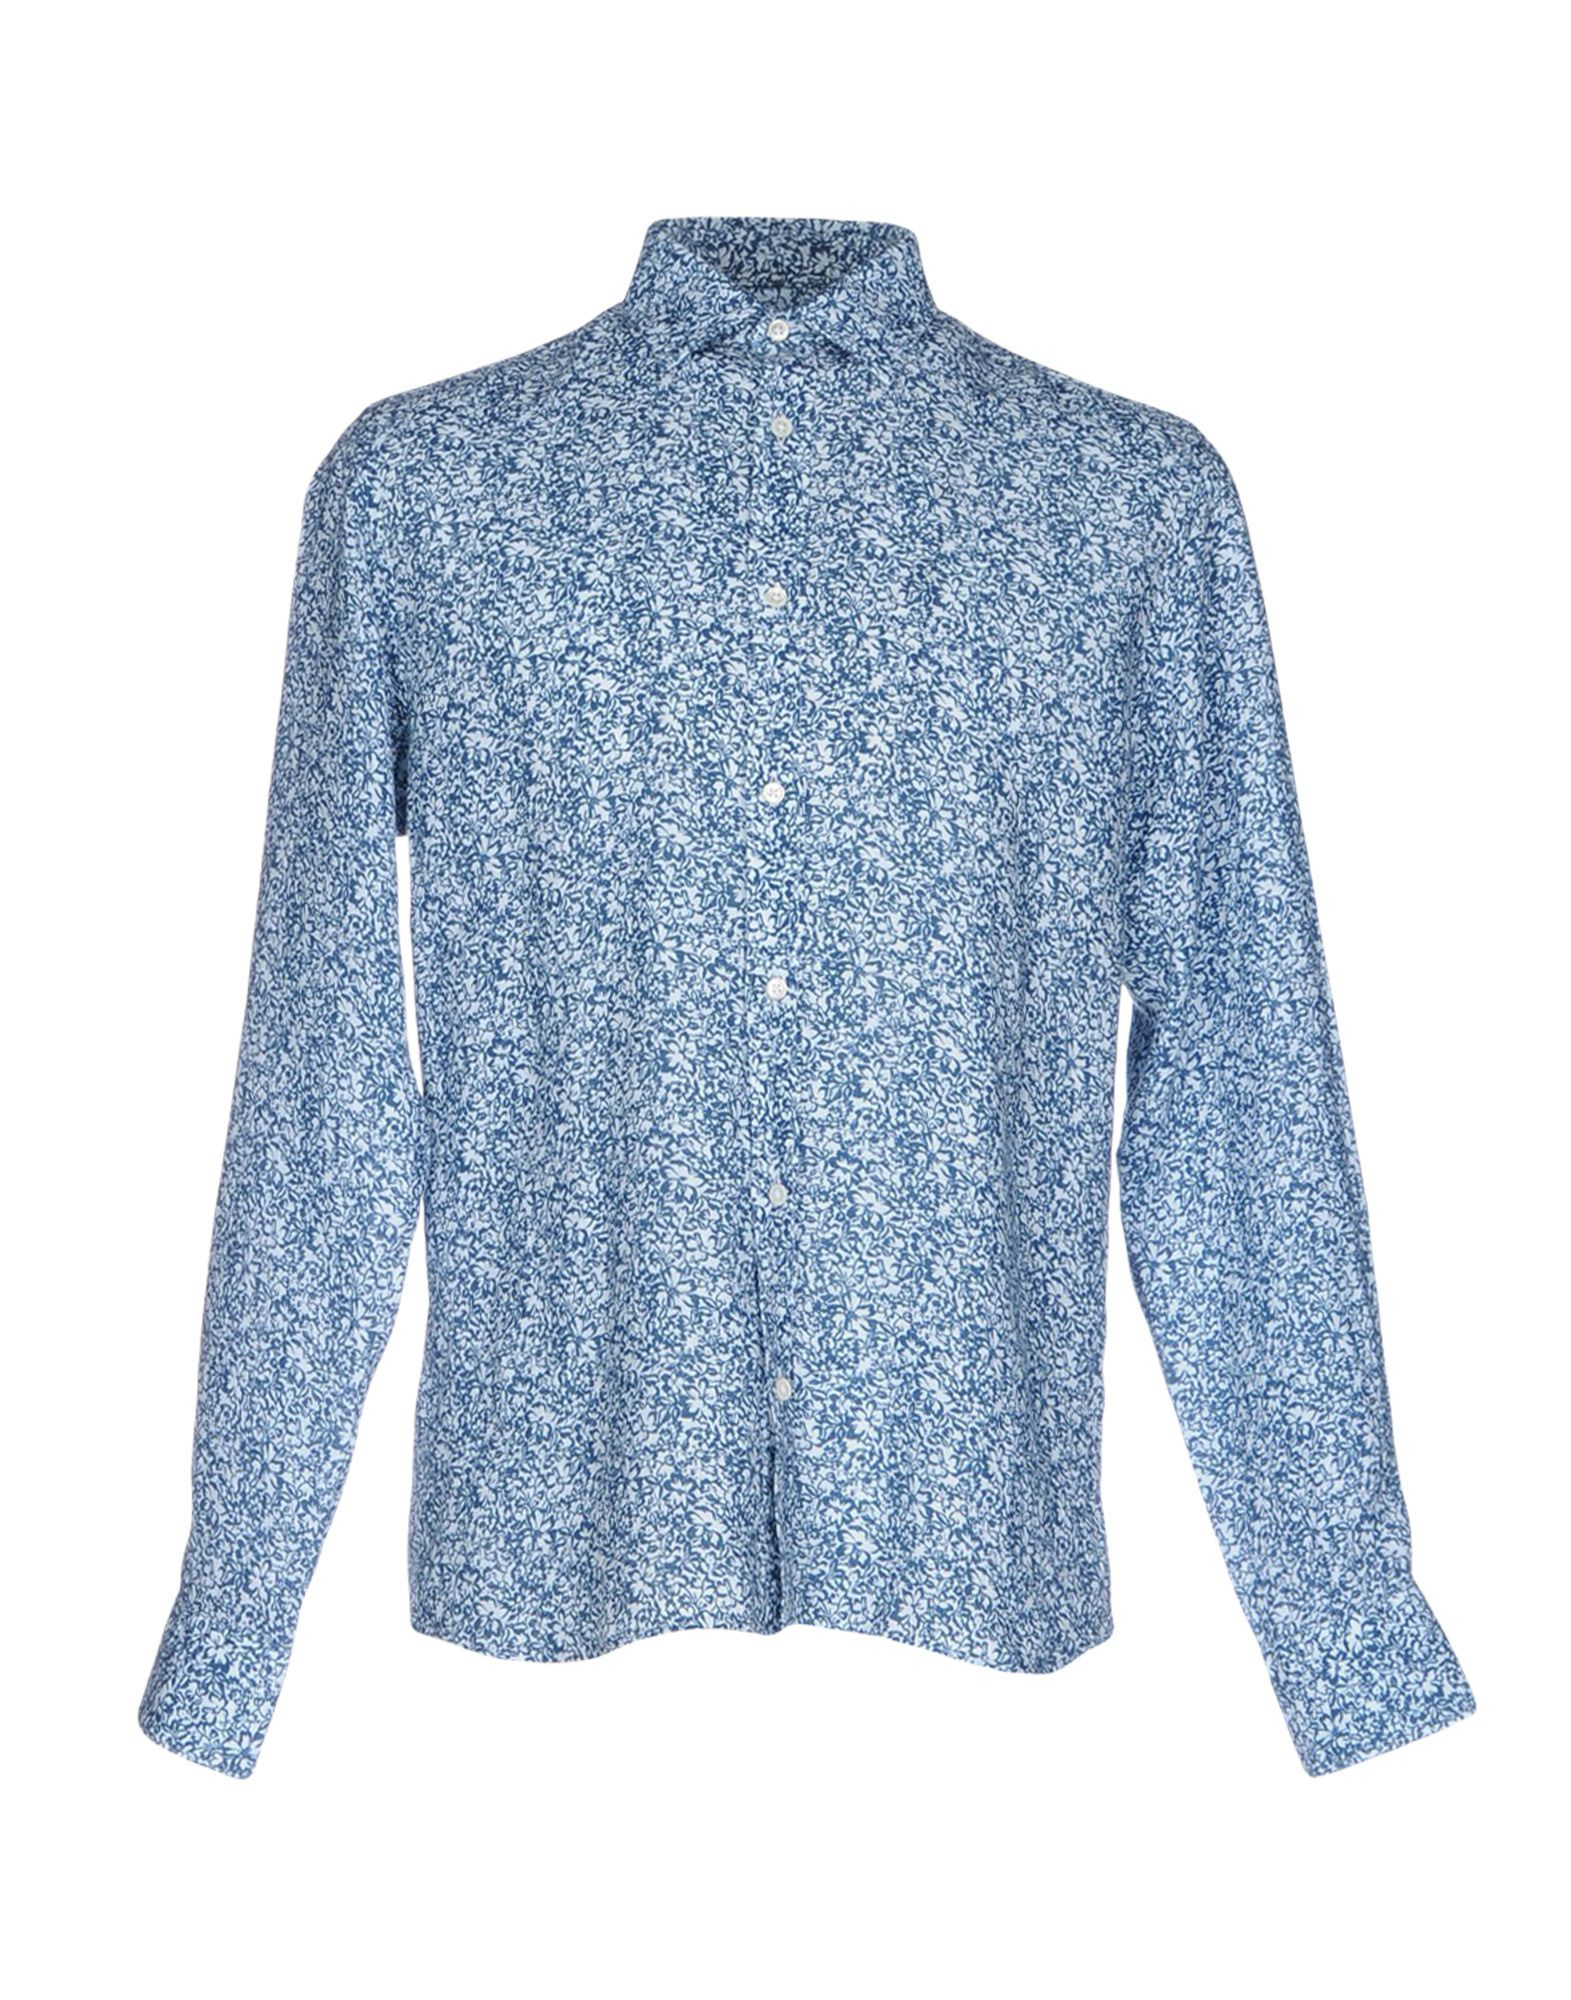 ALTEA dal 1973 Pубашка altea dal 1973 джинсовая рубашка